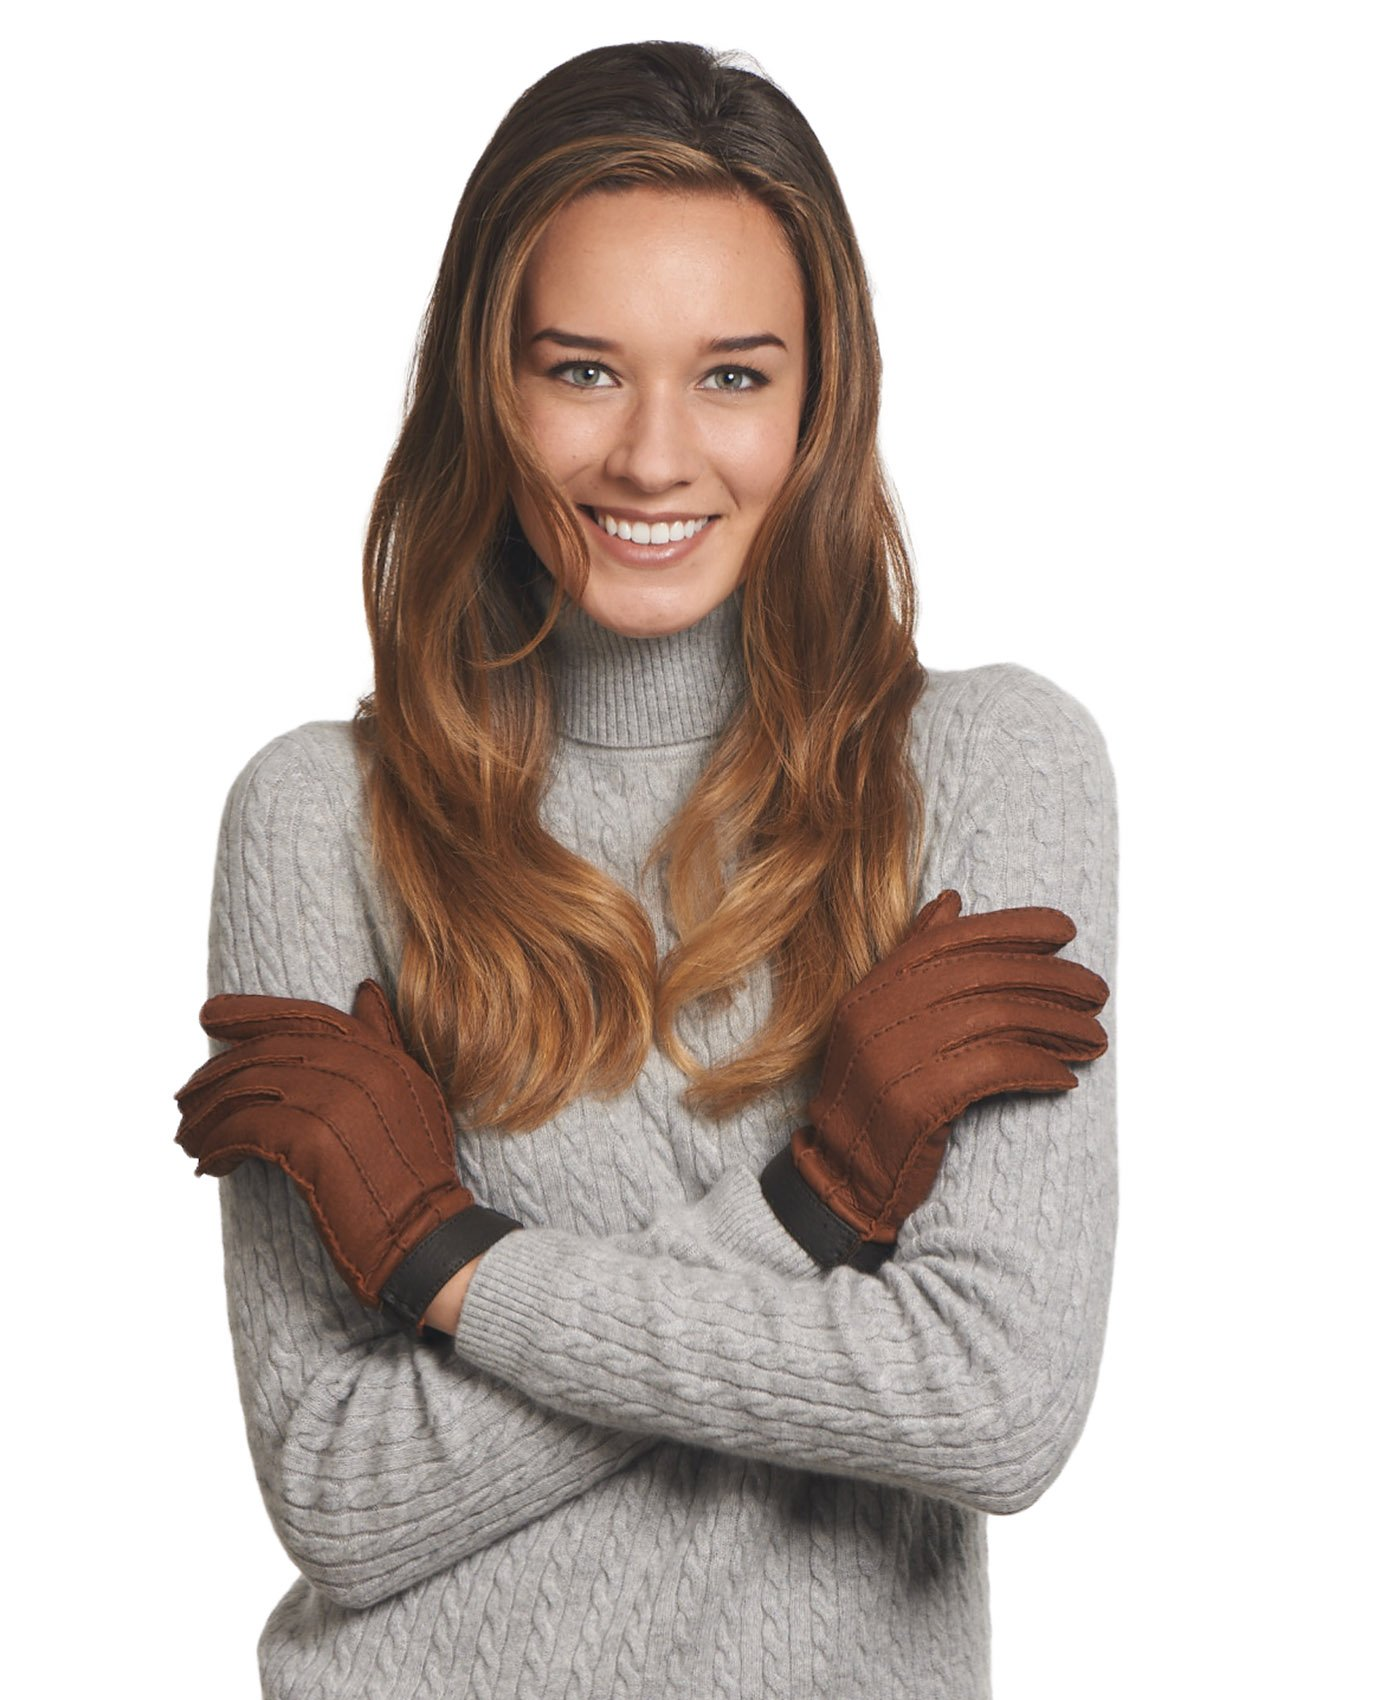 Fratelli Orsini Women's Italian Cashmere Lined Peccary Gloves Size 7 1/2 Color Cork by Fratelli Orsini (Image #4)